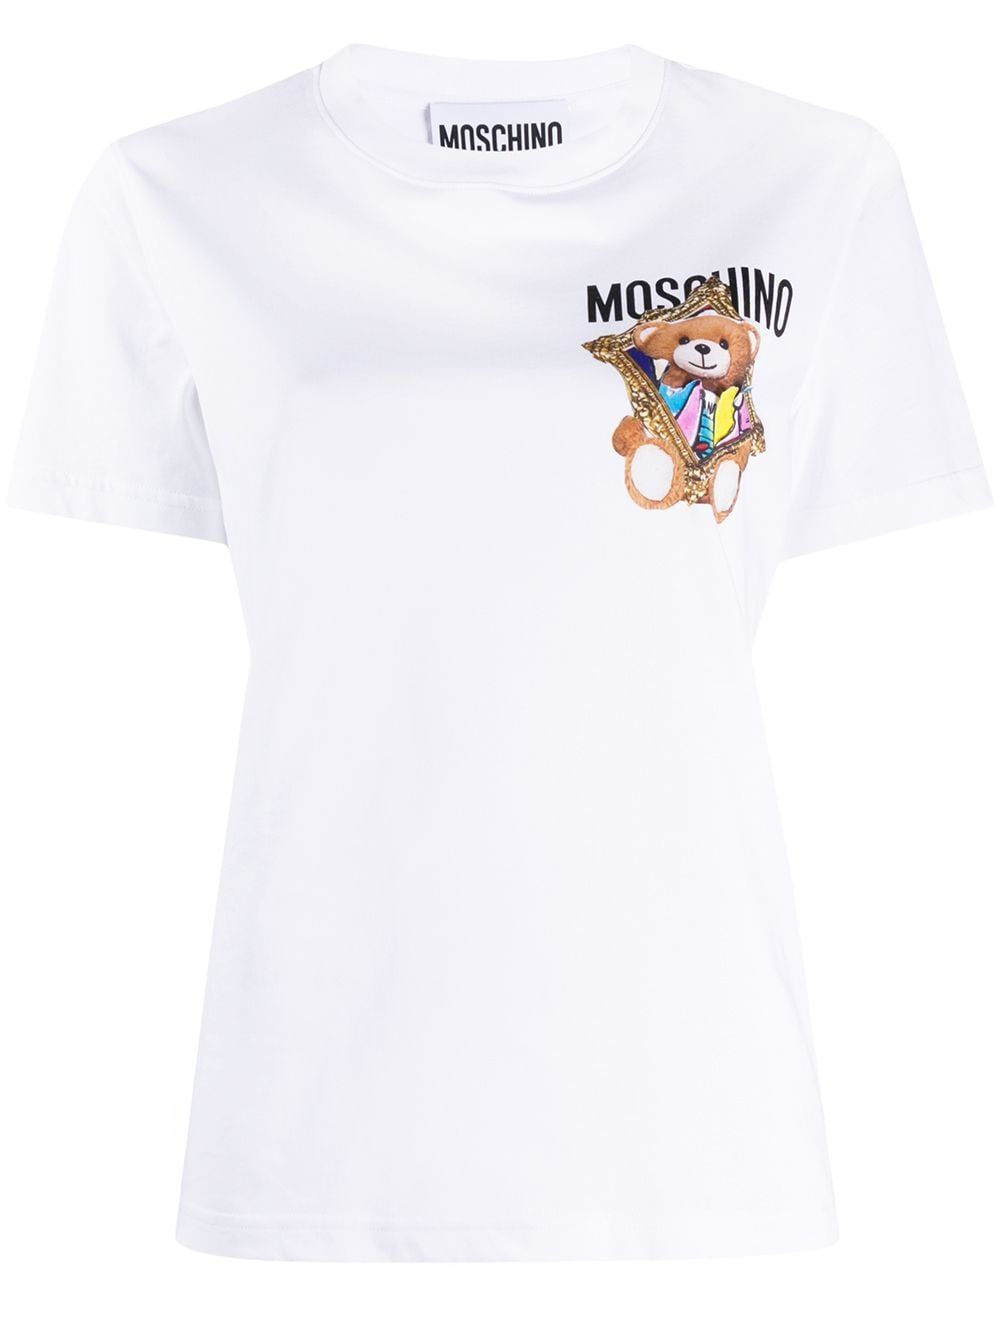 MOSCHINO WOMEN'S V070404401001 WHITE COTTON T-SHIRT